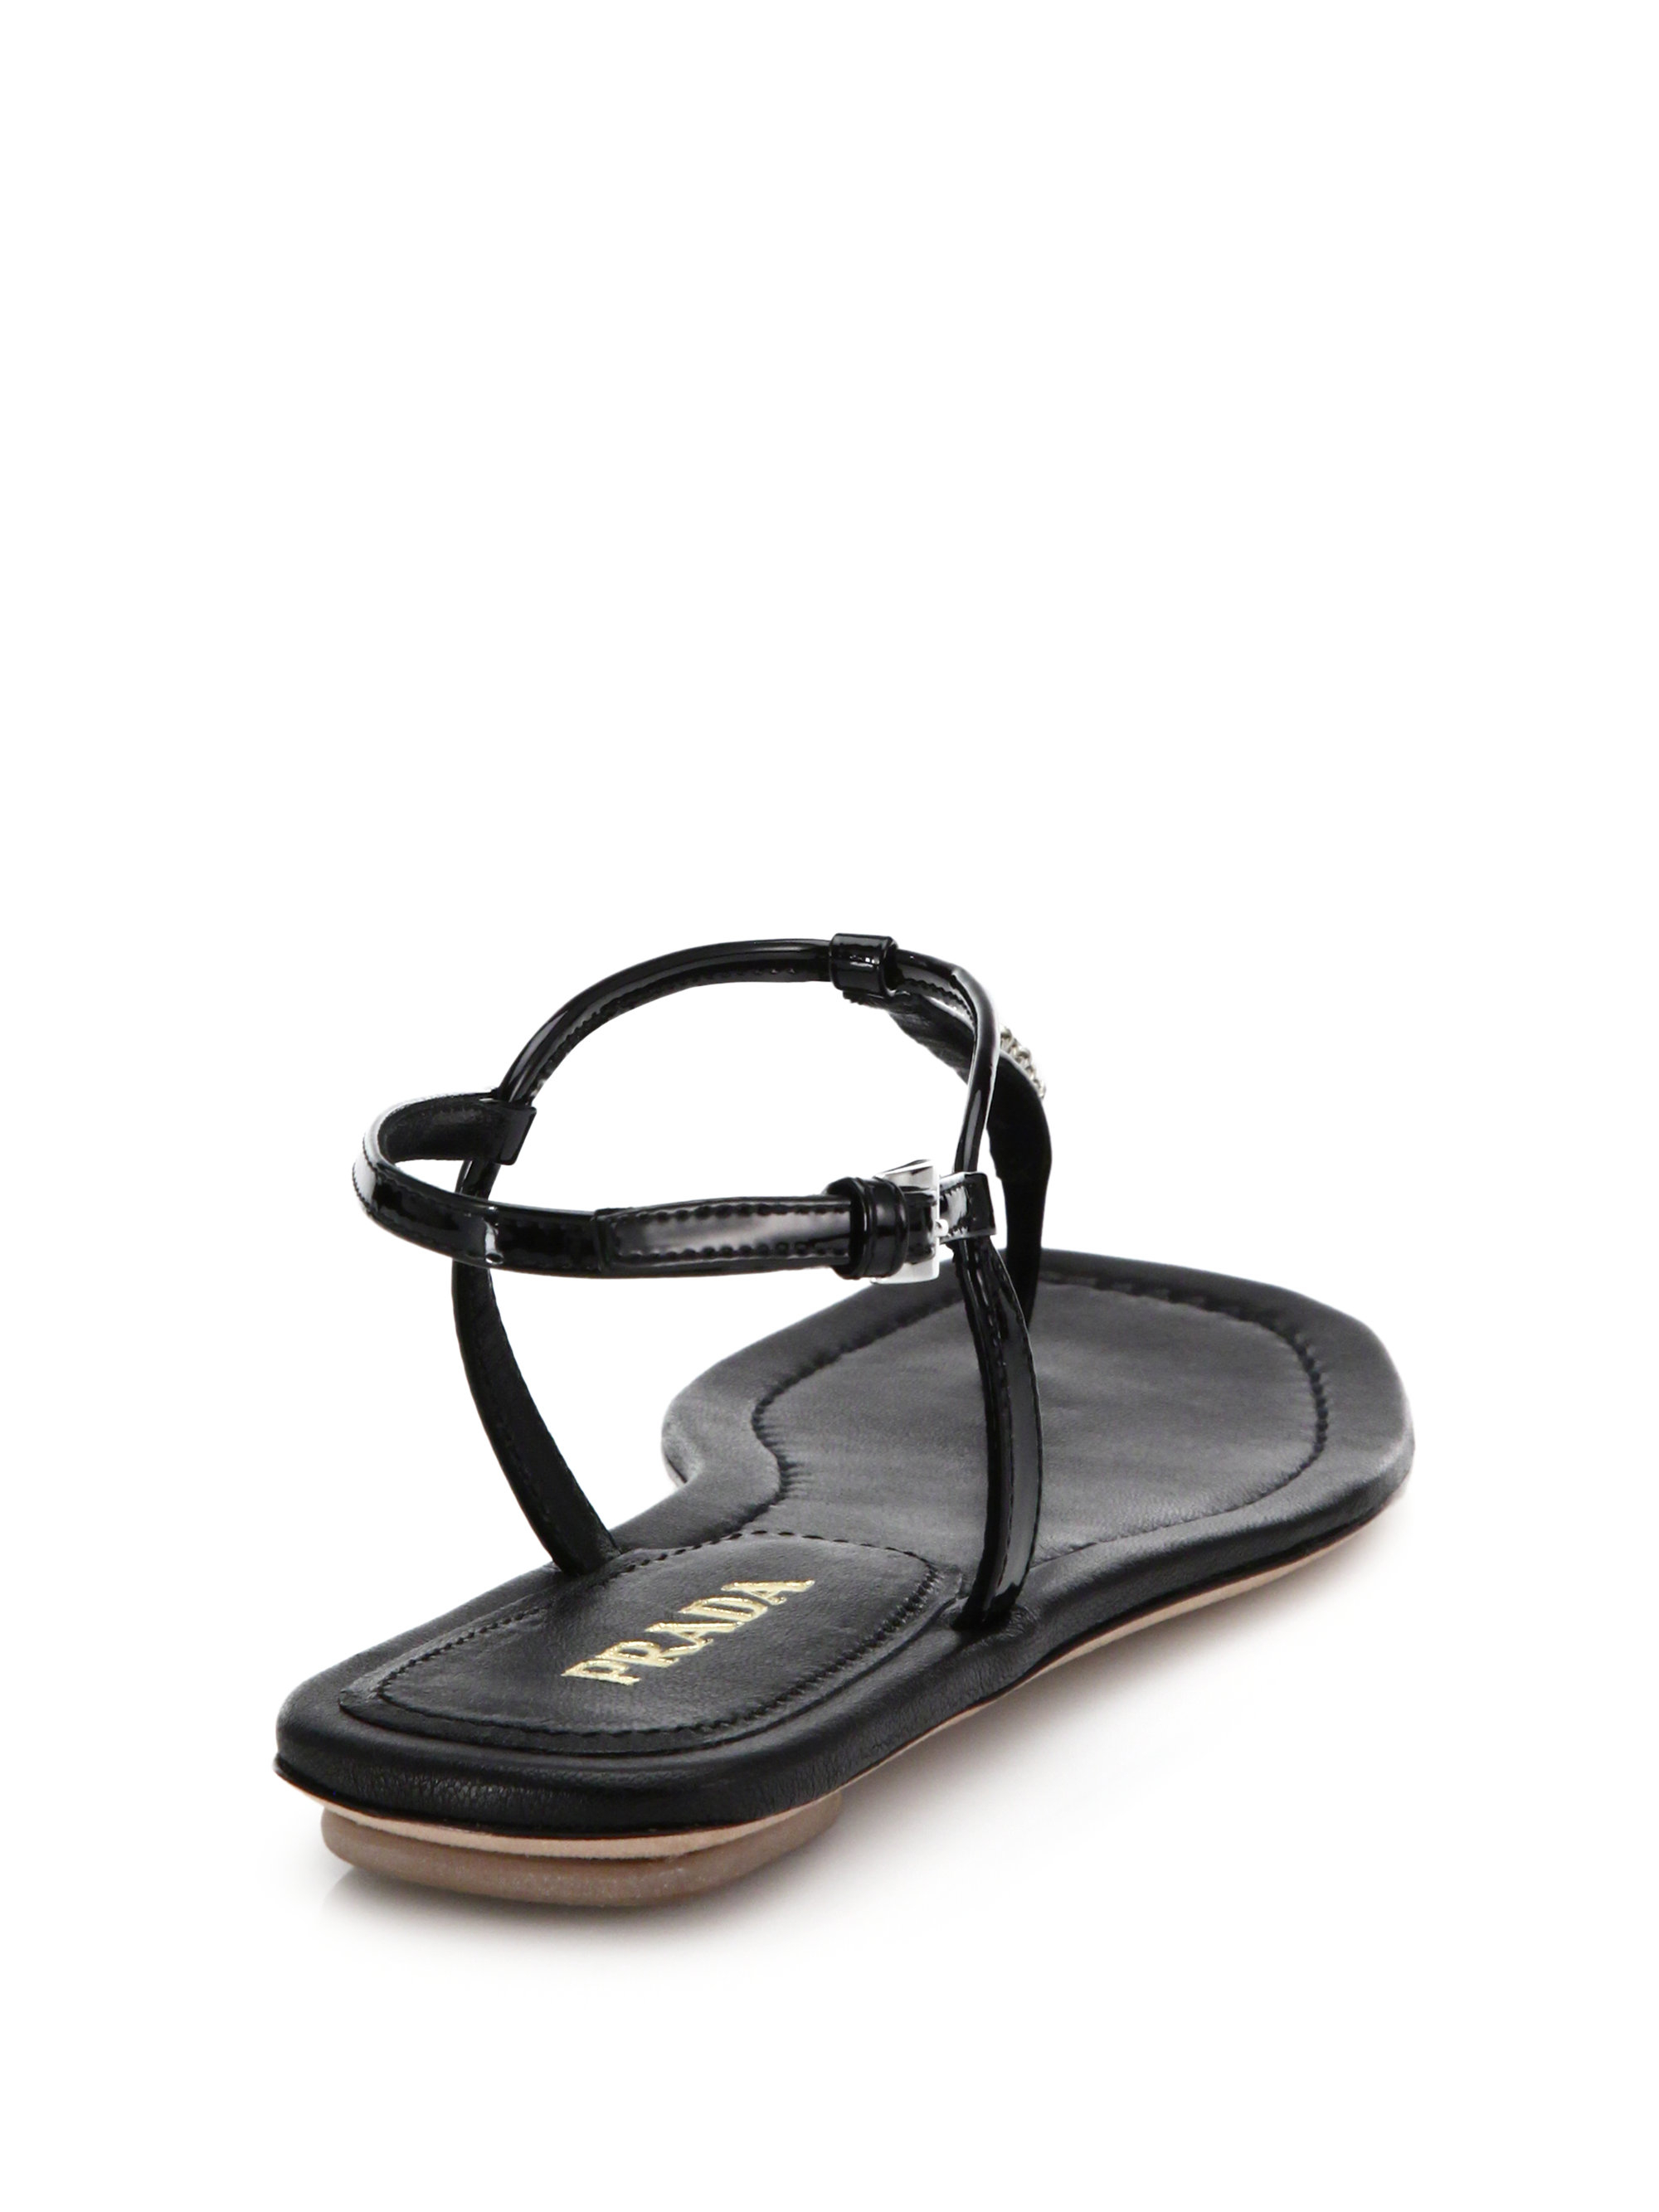 34de95d76c8 Lyst - Prada Swarovski Crystal Flat Leather Sandals in Black